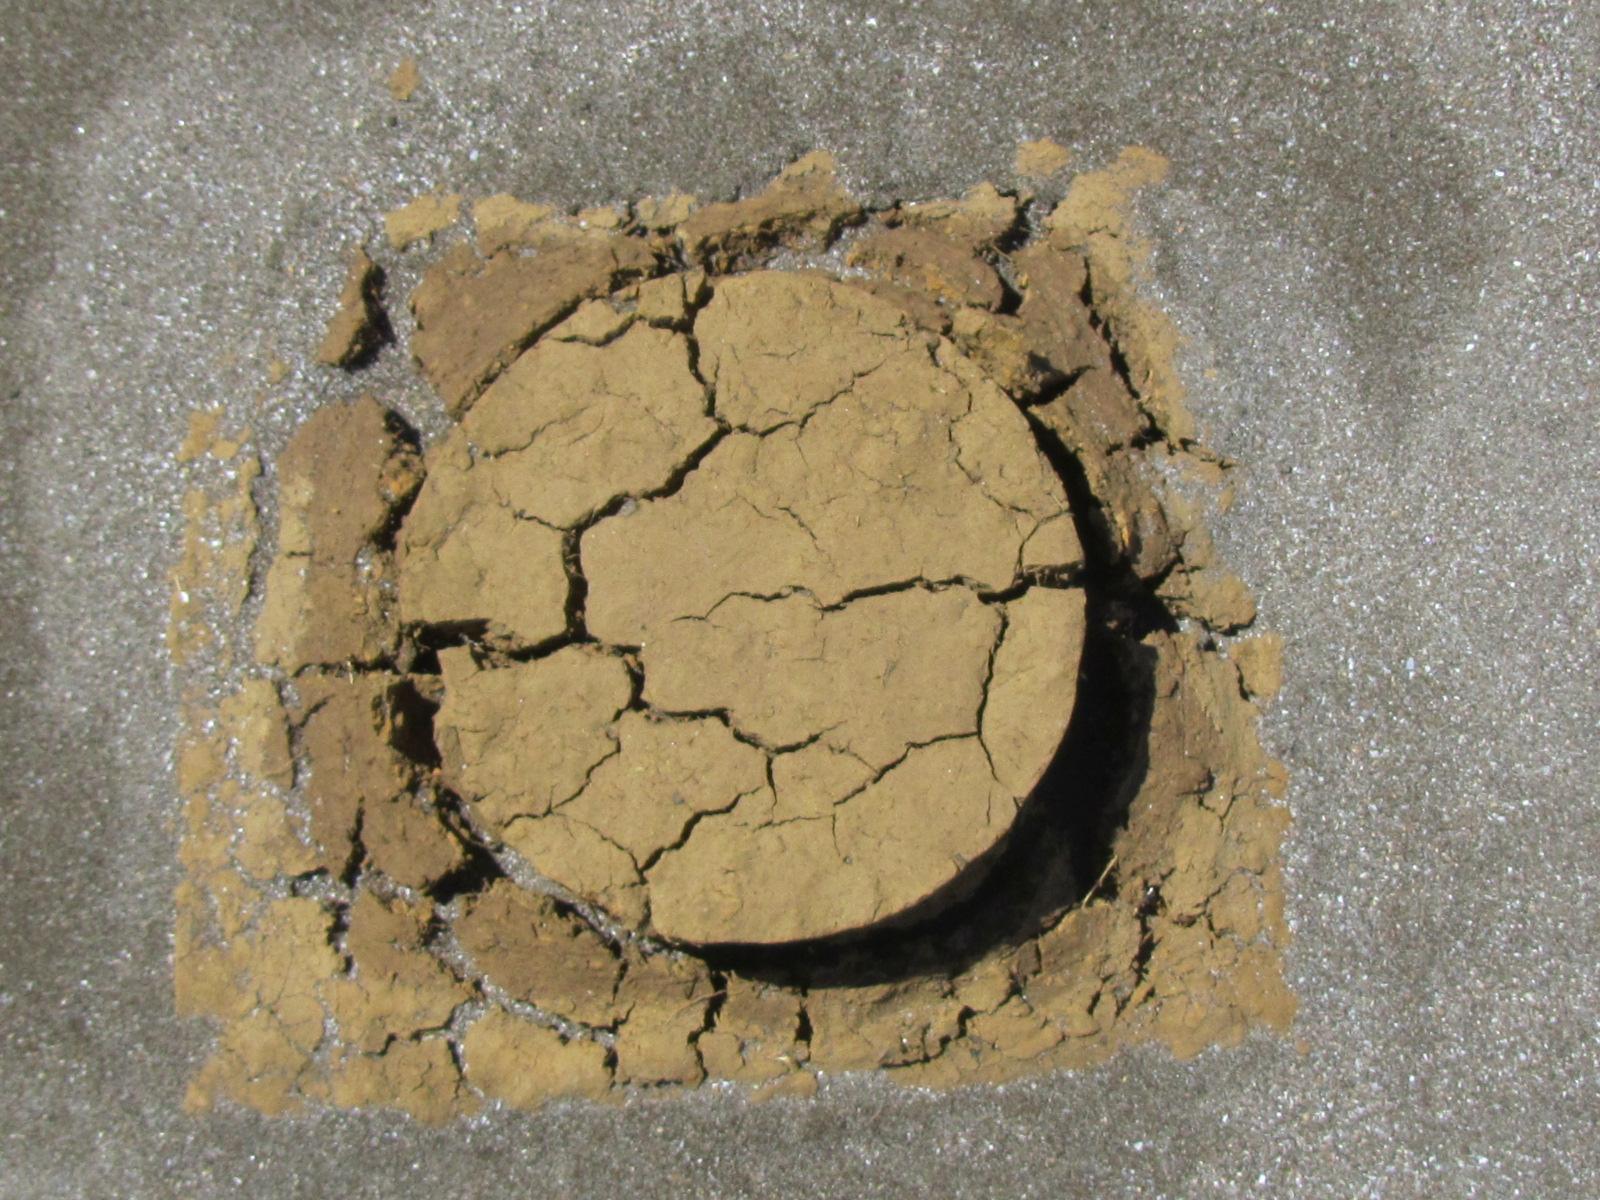 micro-soilism - 2011 - soil; PVA; sand